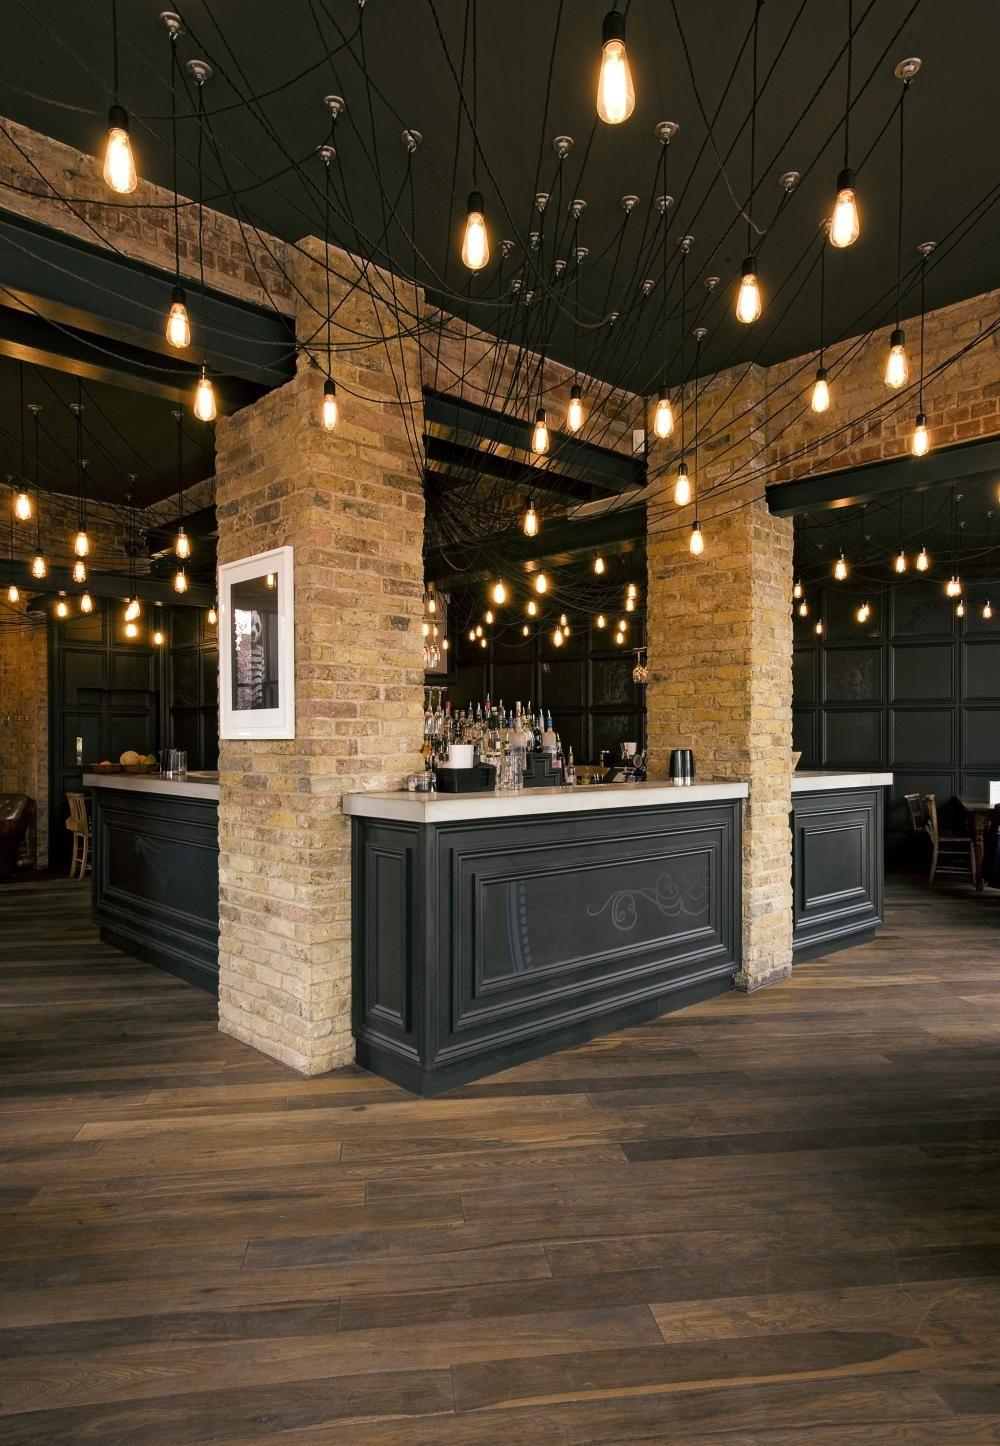 industrial bar lighting. Restaurant Design - Great Inspiration Photo Front Of The Bar Treatment.Love Lights, Black, And Bricks Industrial Lighting I